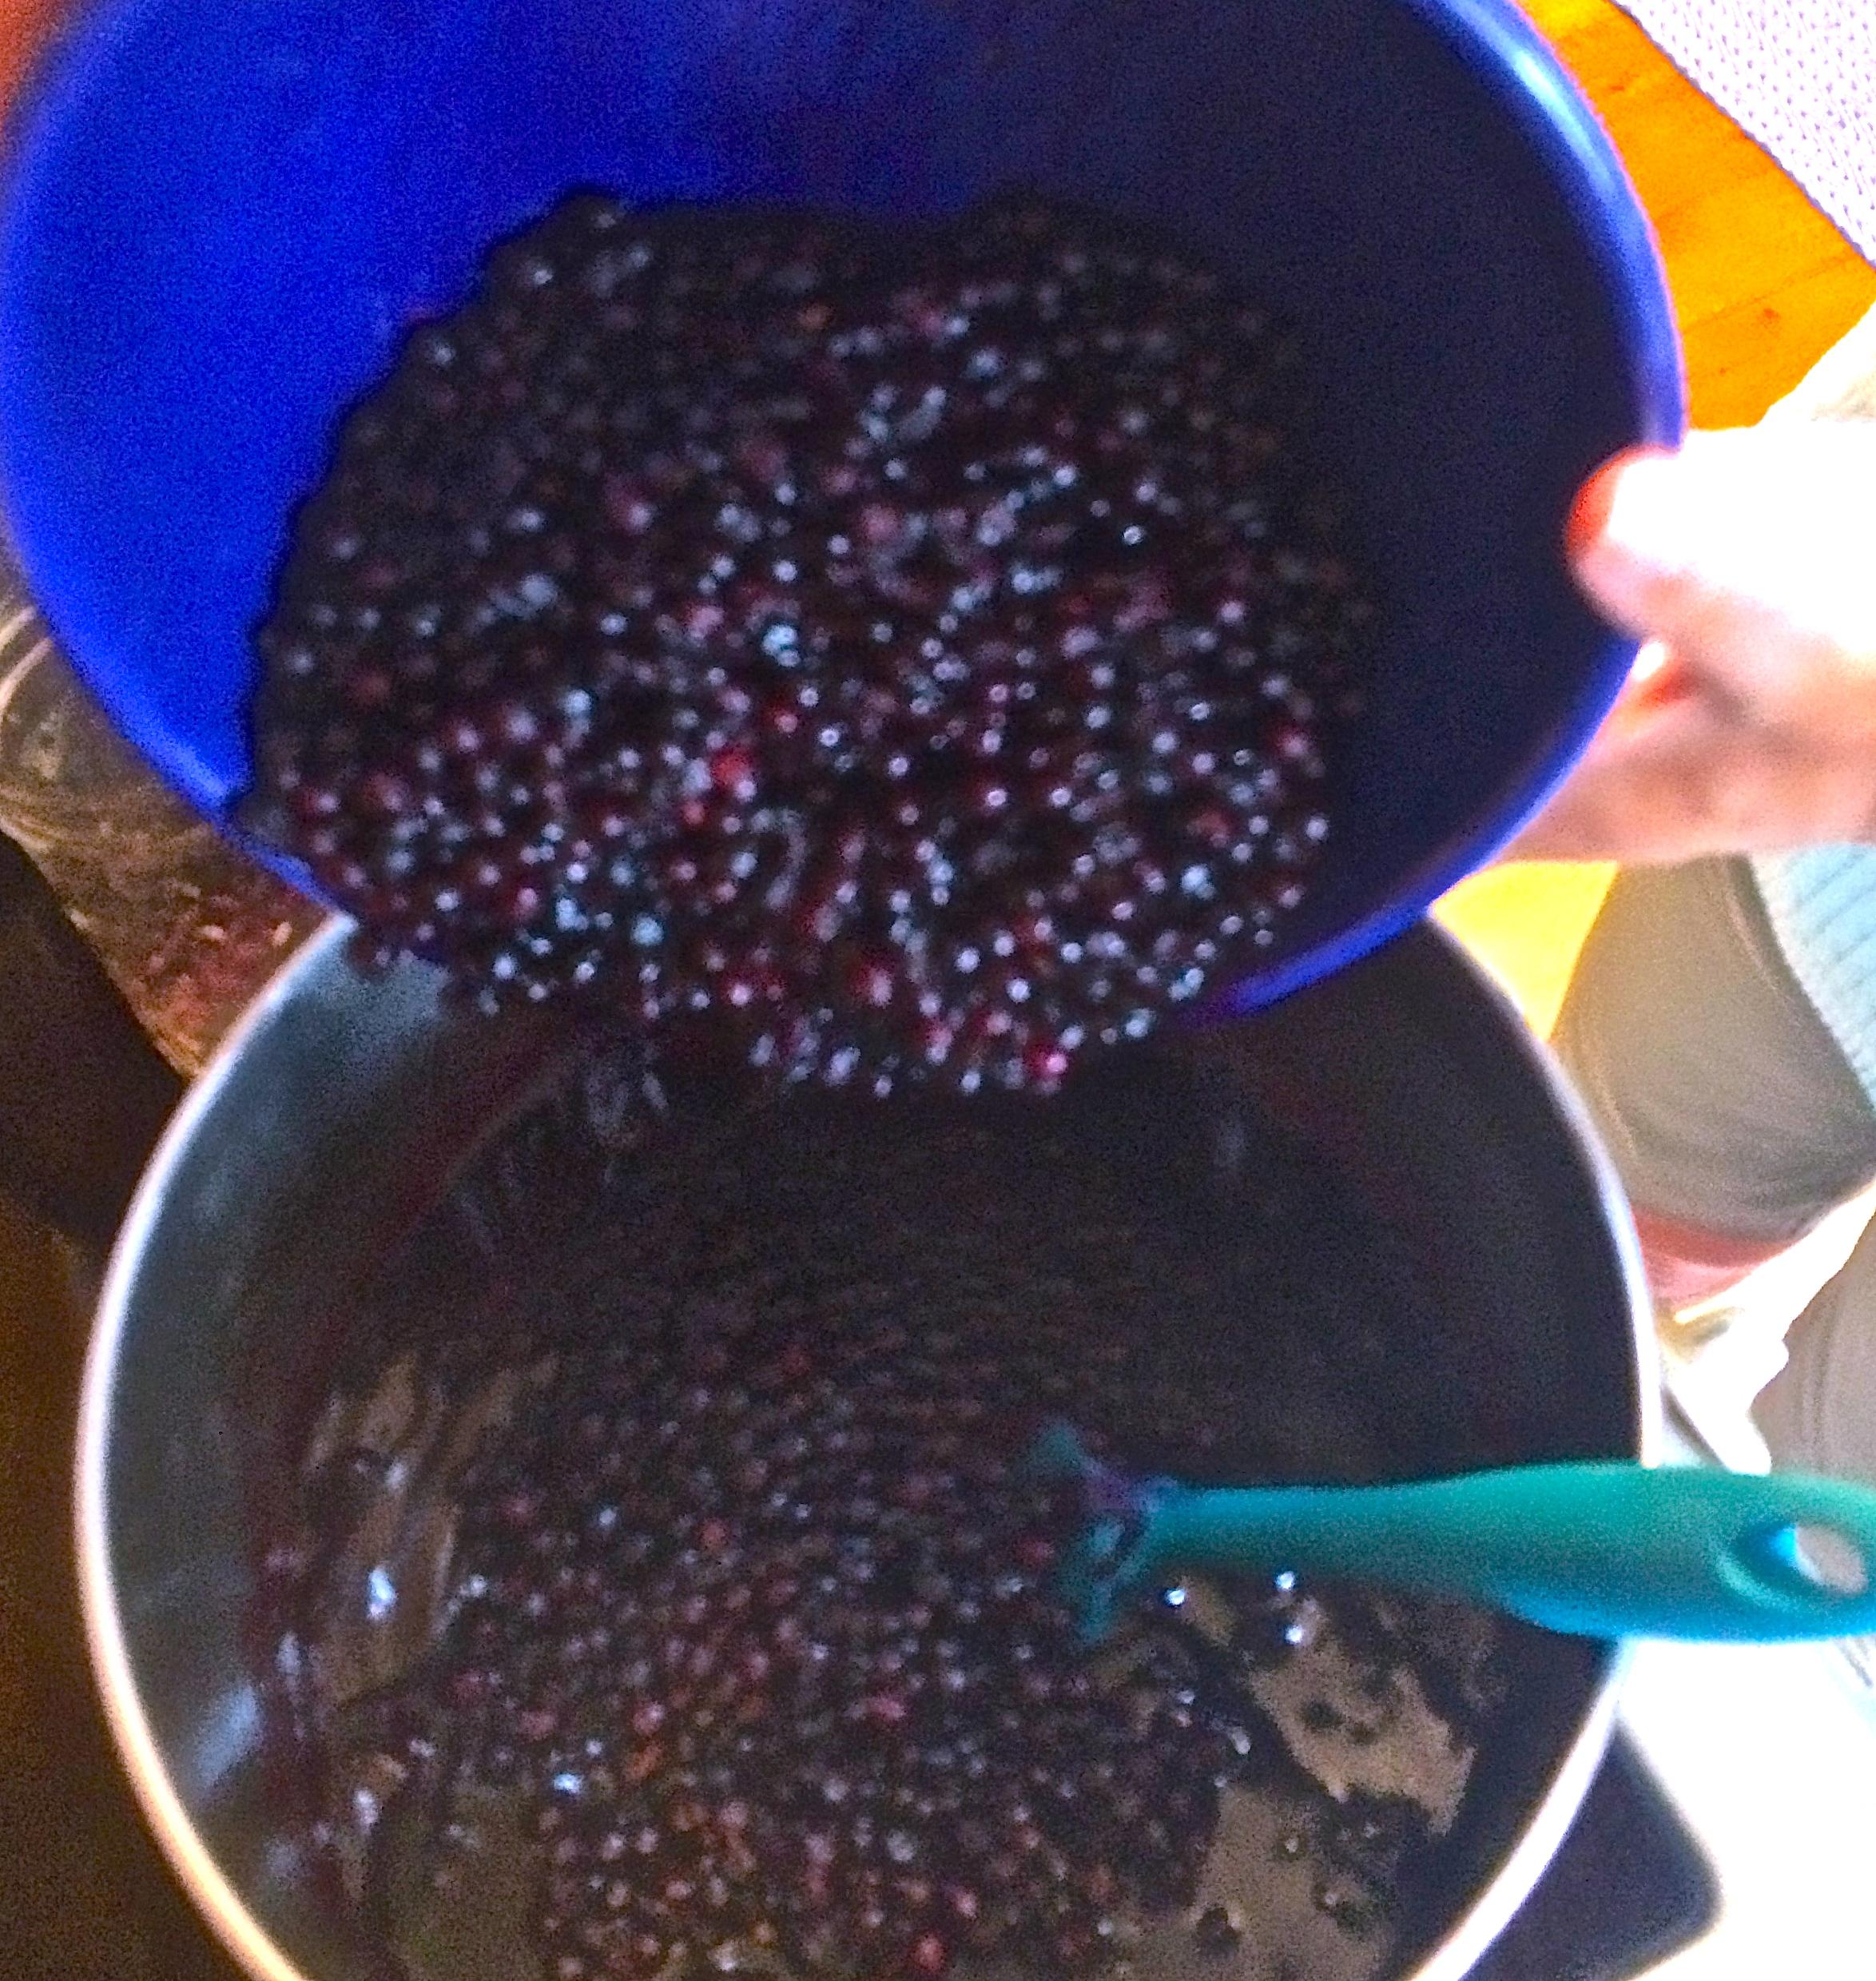 Keep adding berries...